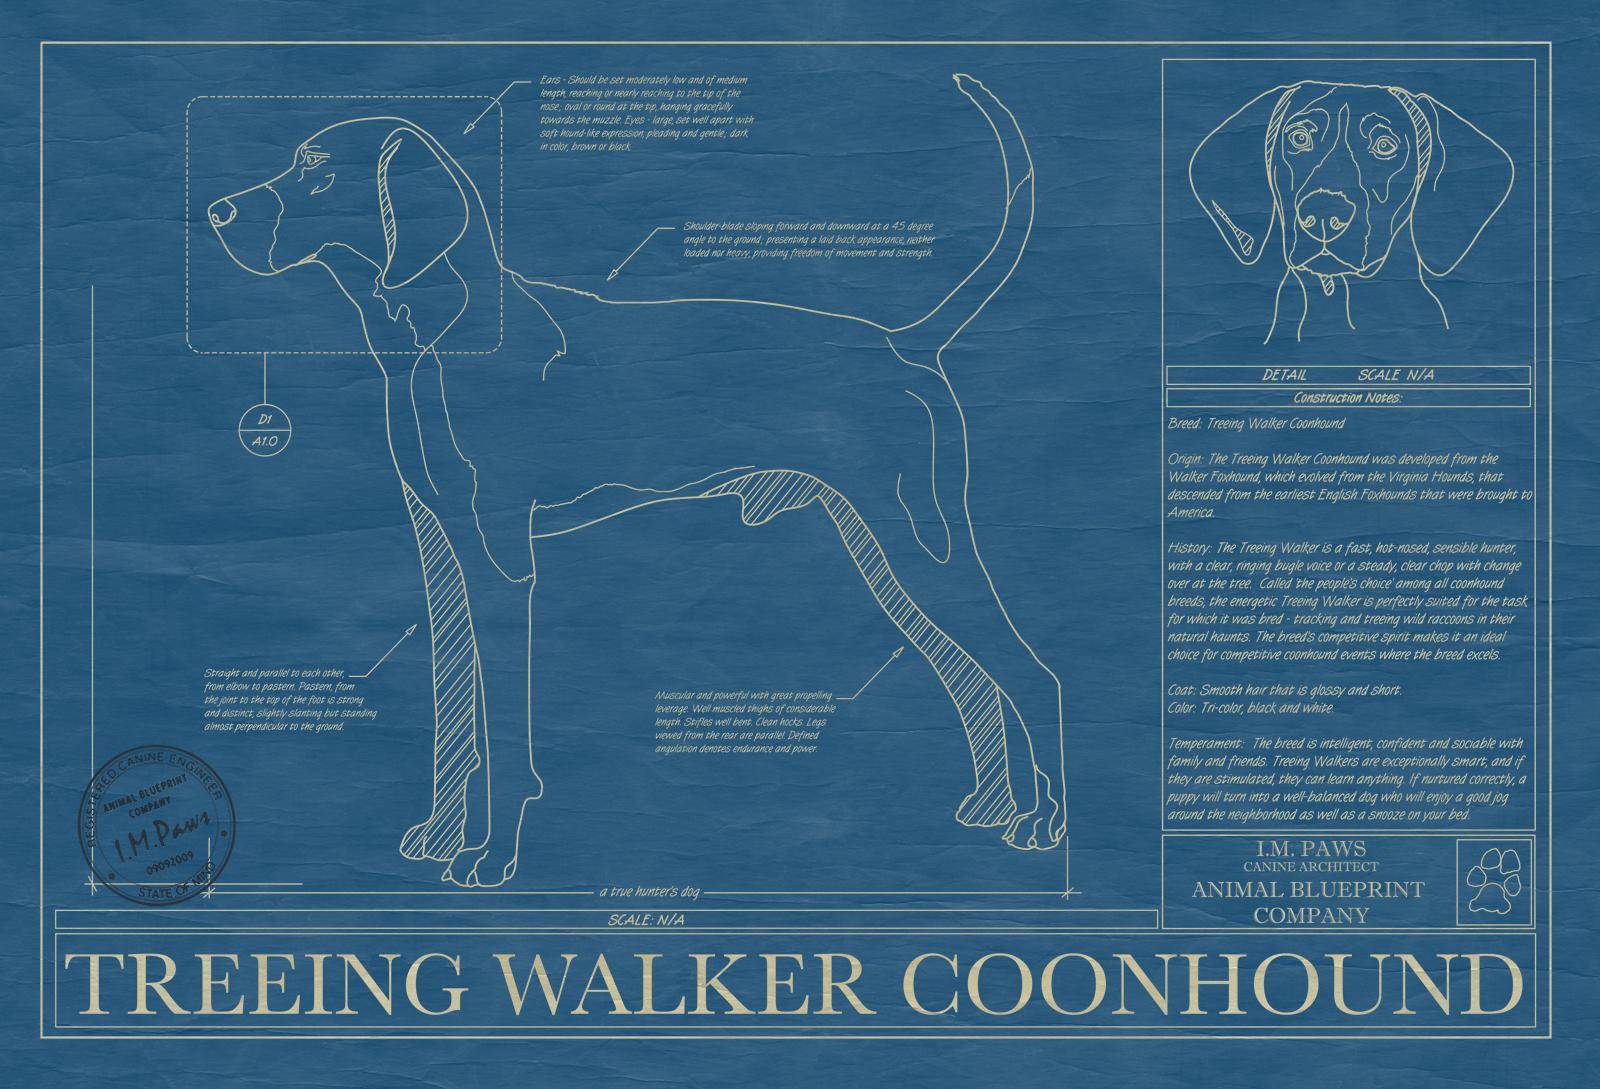 Treeing walker coonhound animal blueprint company treeing walker coonhound dog blueprint malvernweather Images